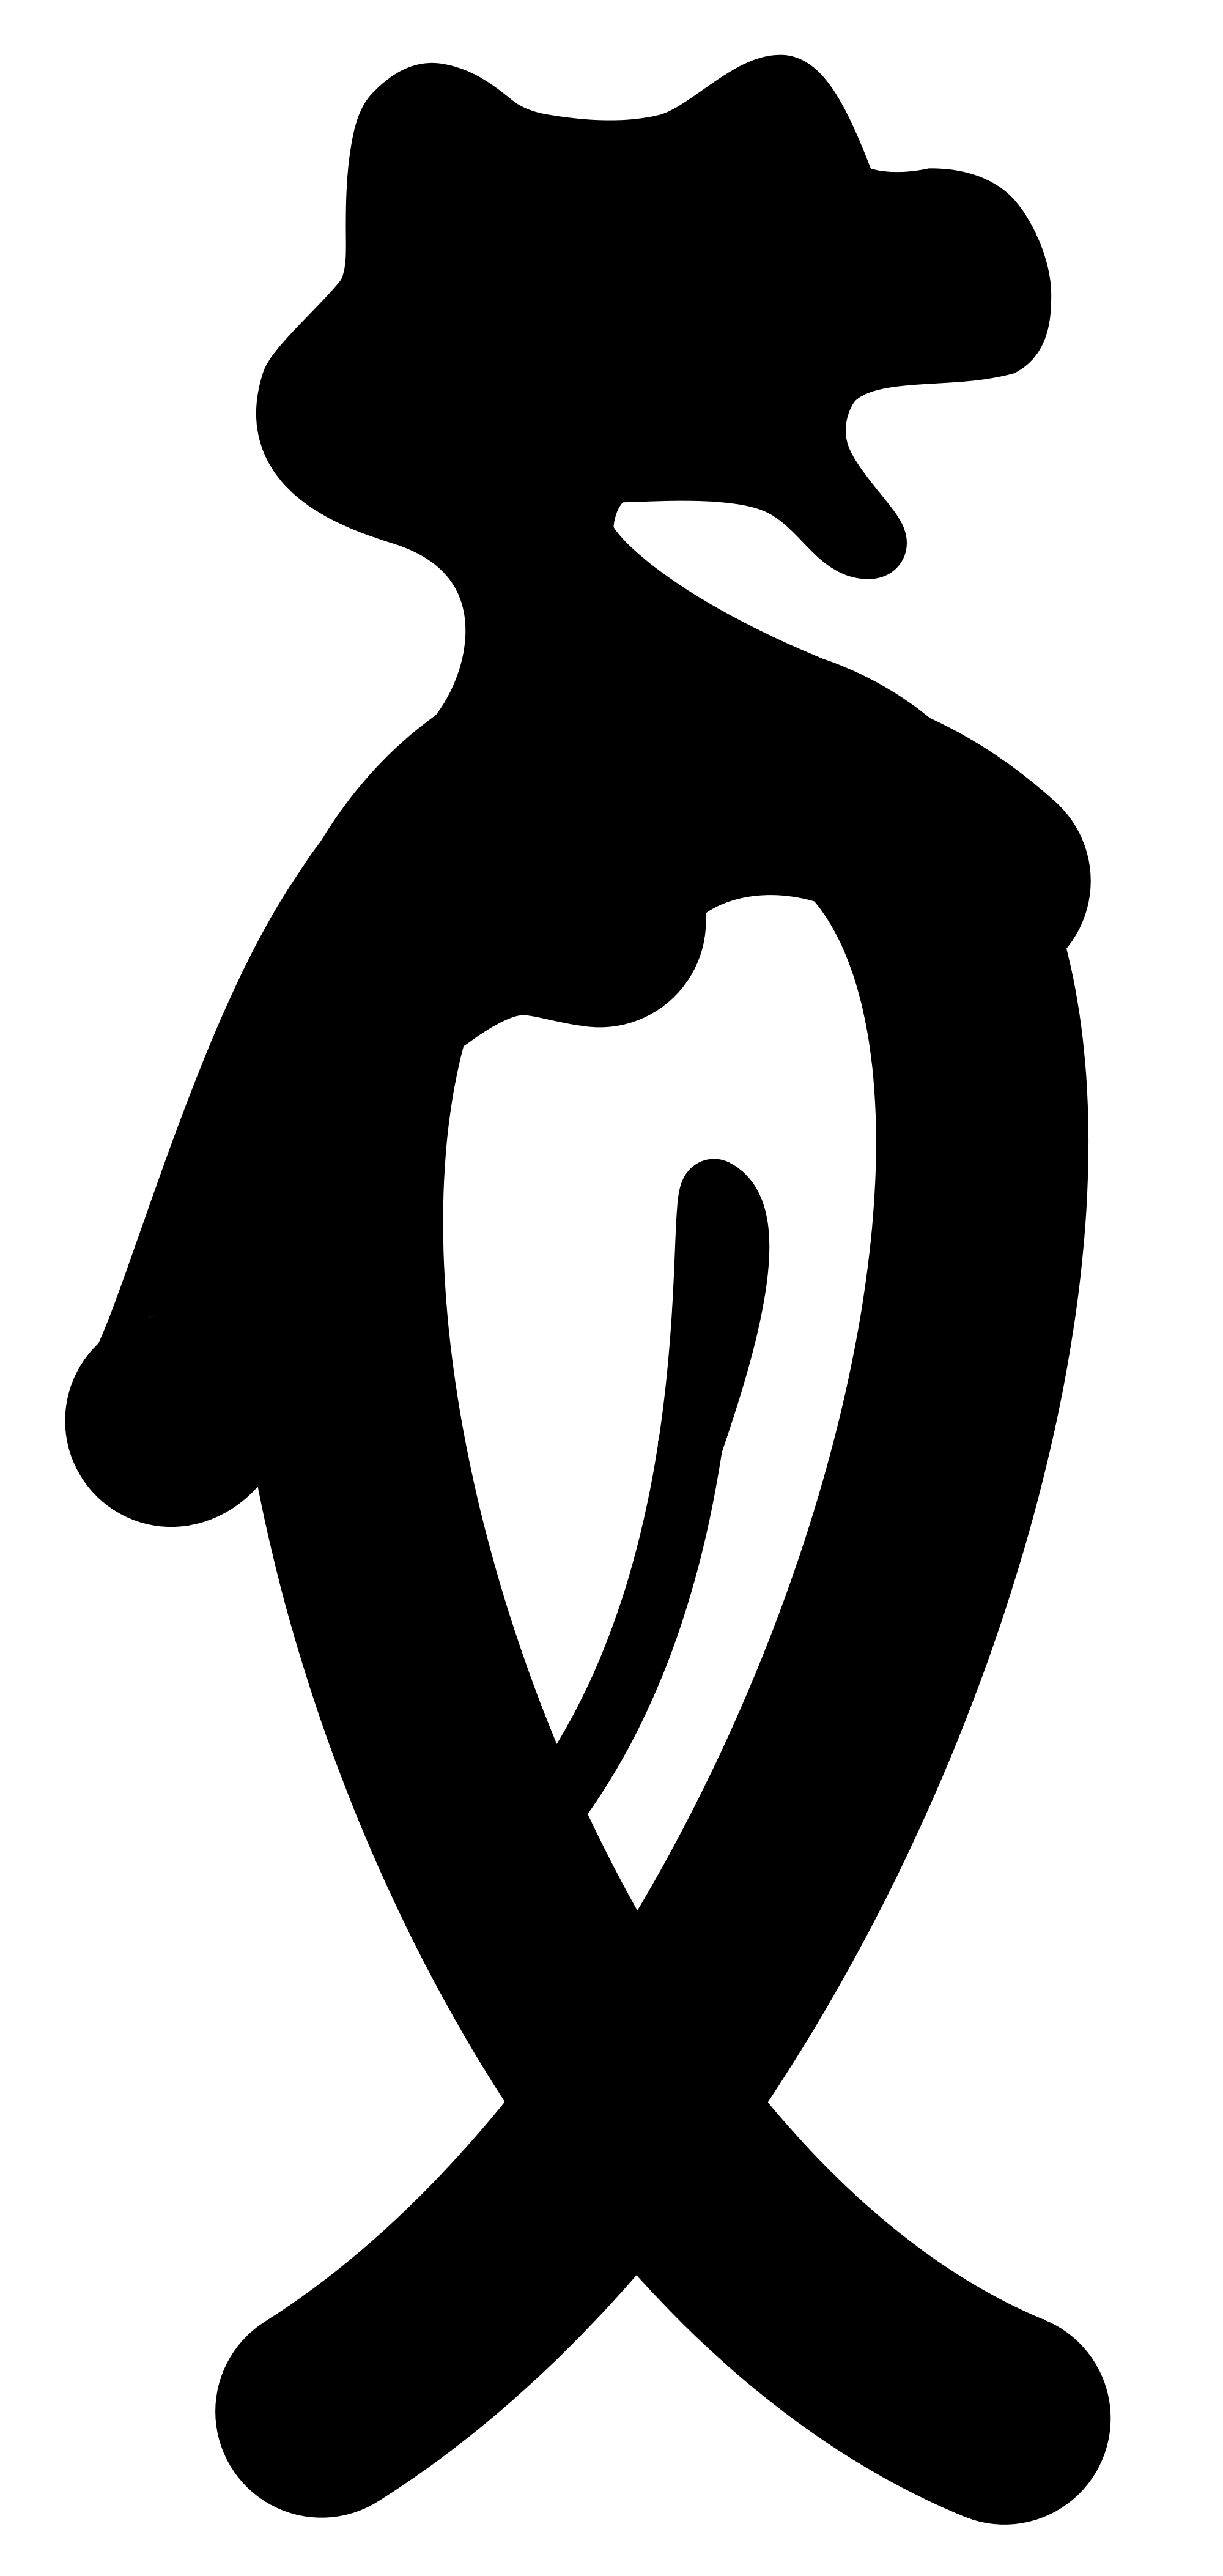 File:11 Parthenope symbol.svg.